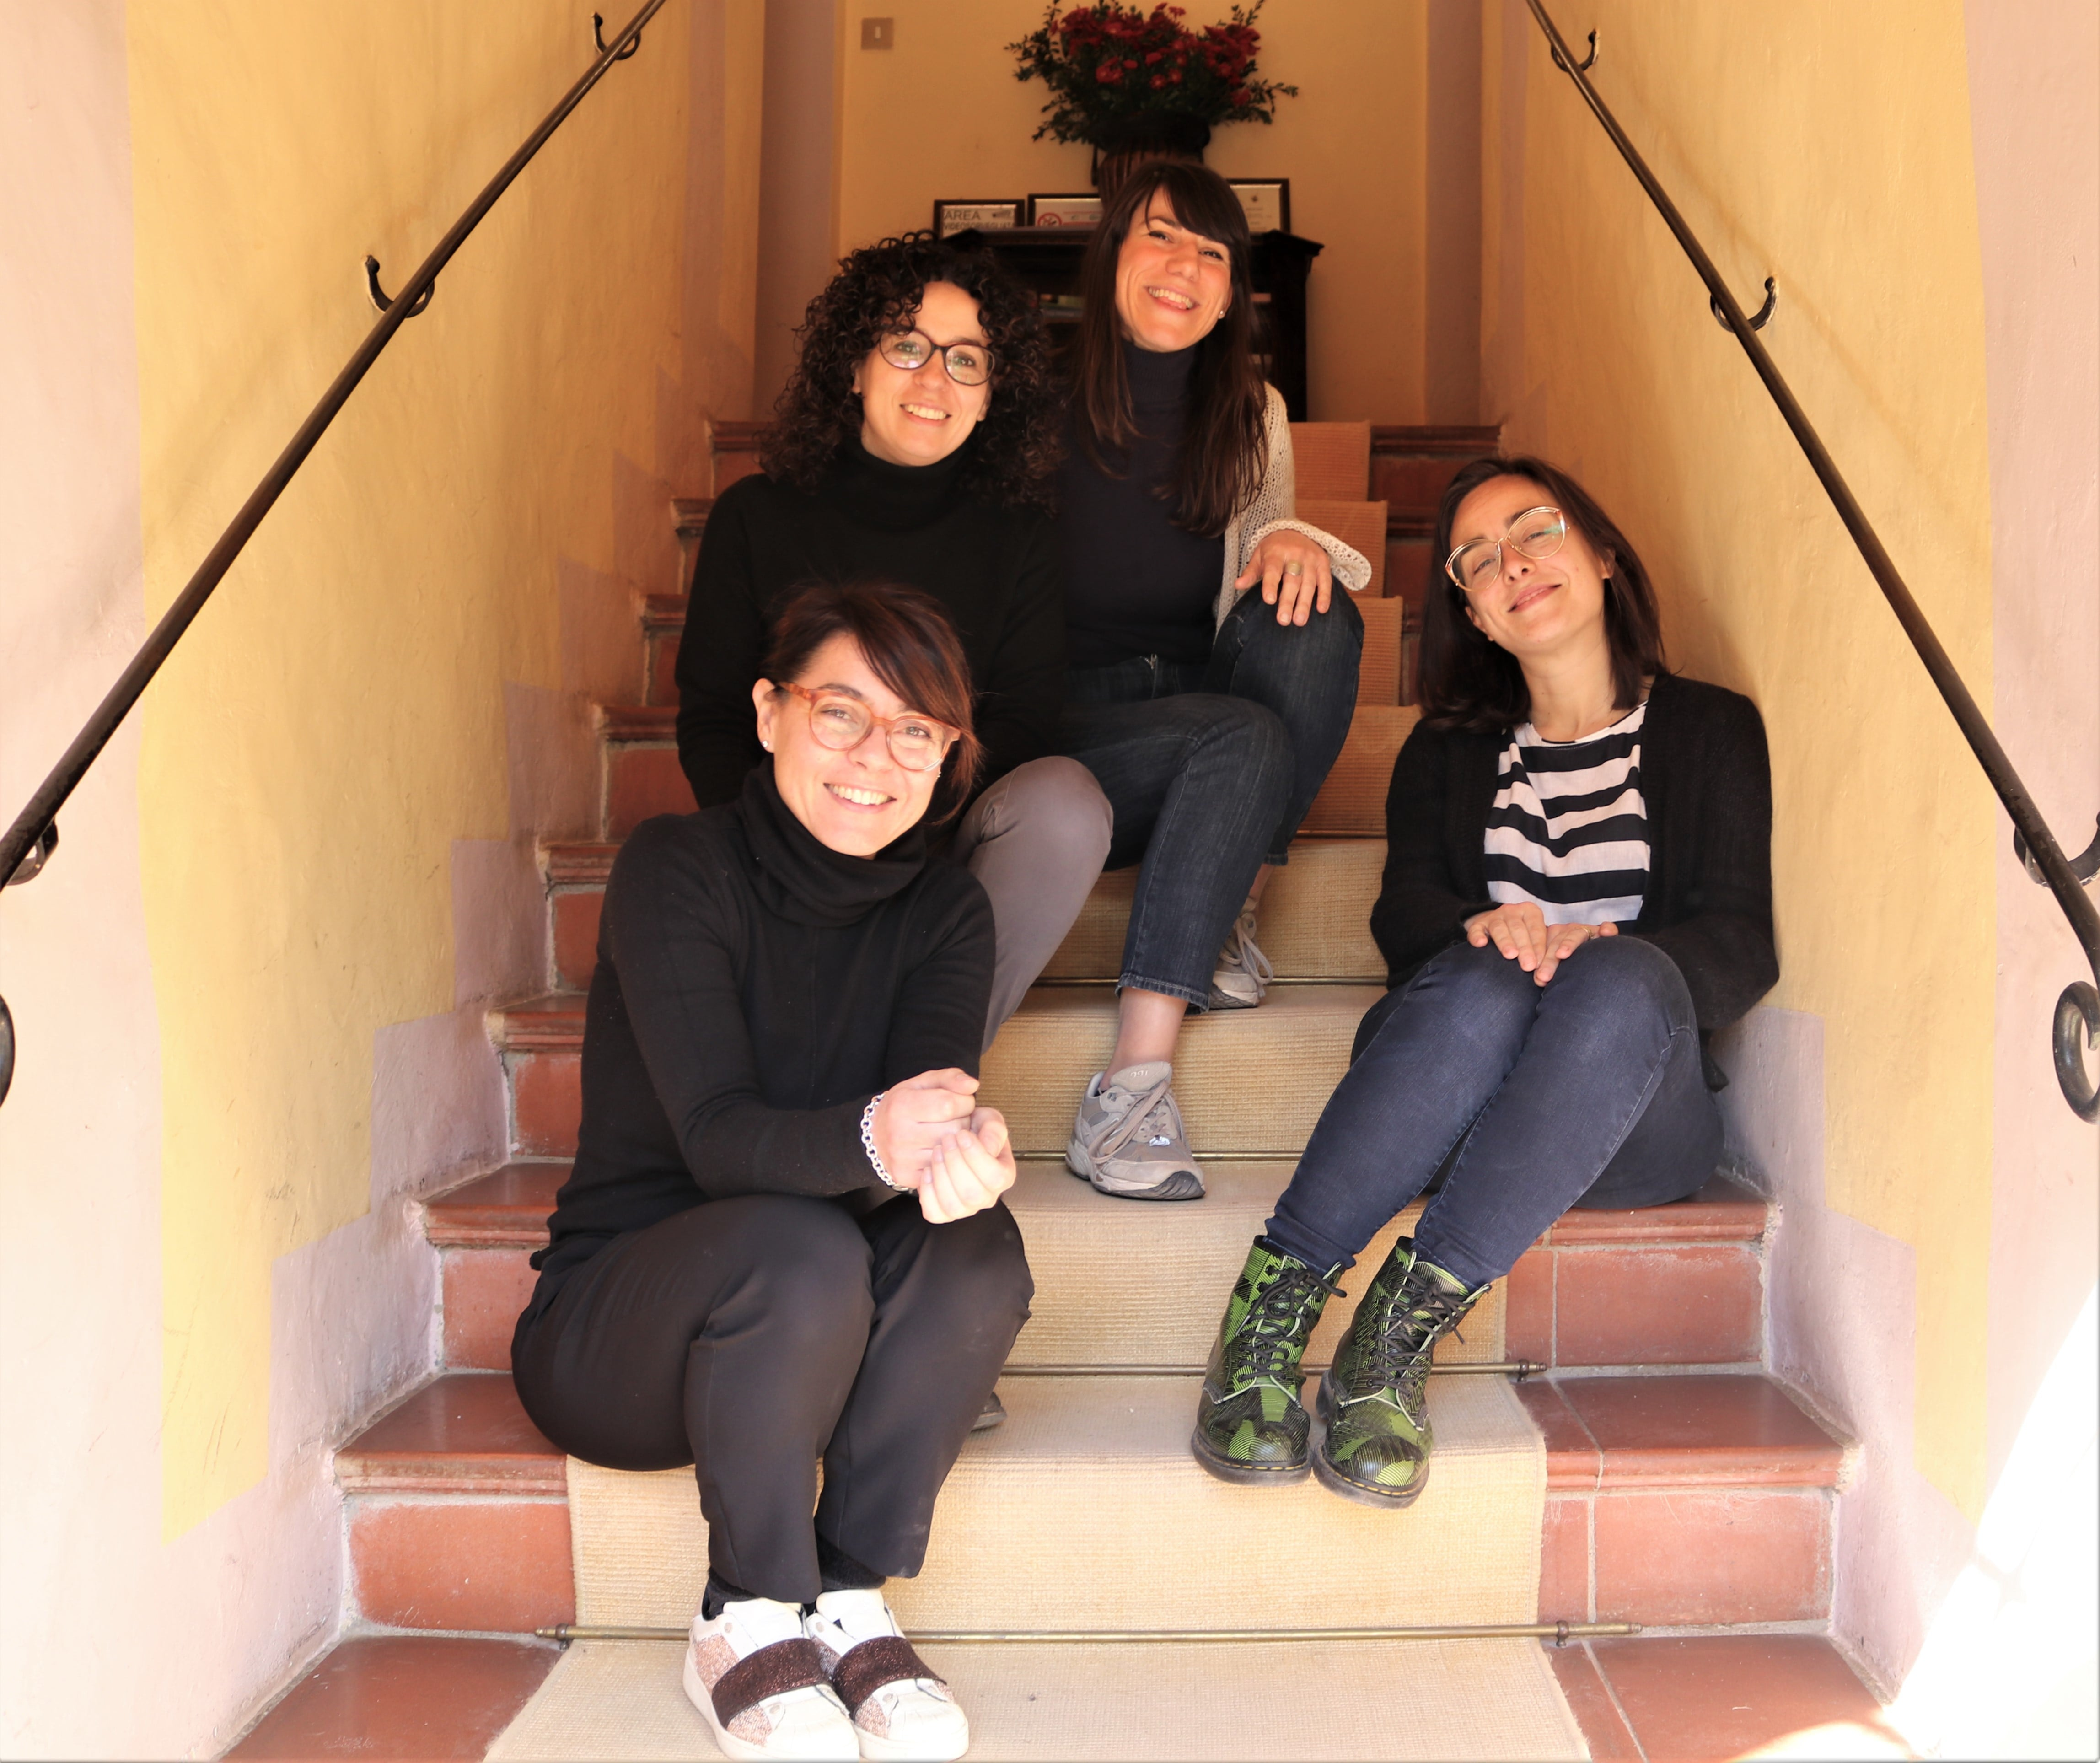 Tourism and covid-19 the team of Fattoria del Colle Sara Alessia Silvia and Carolina